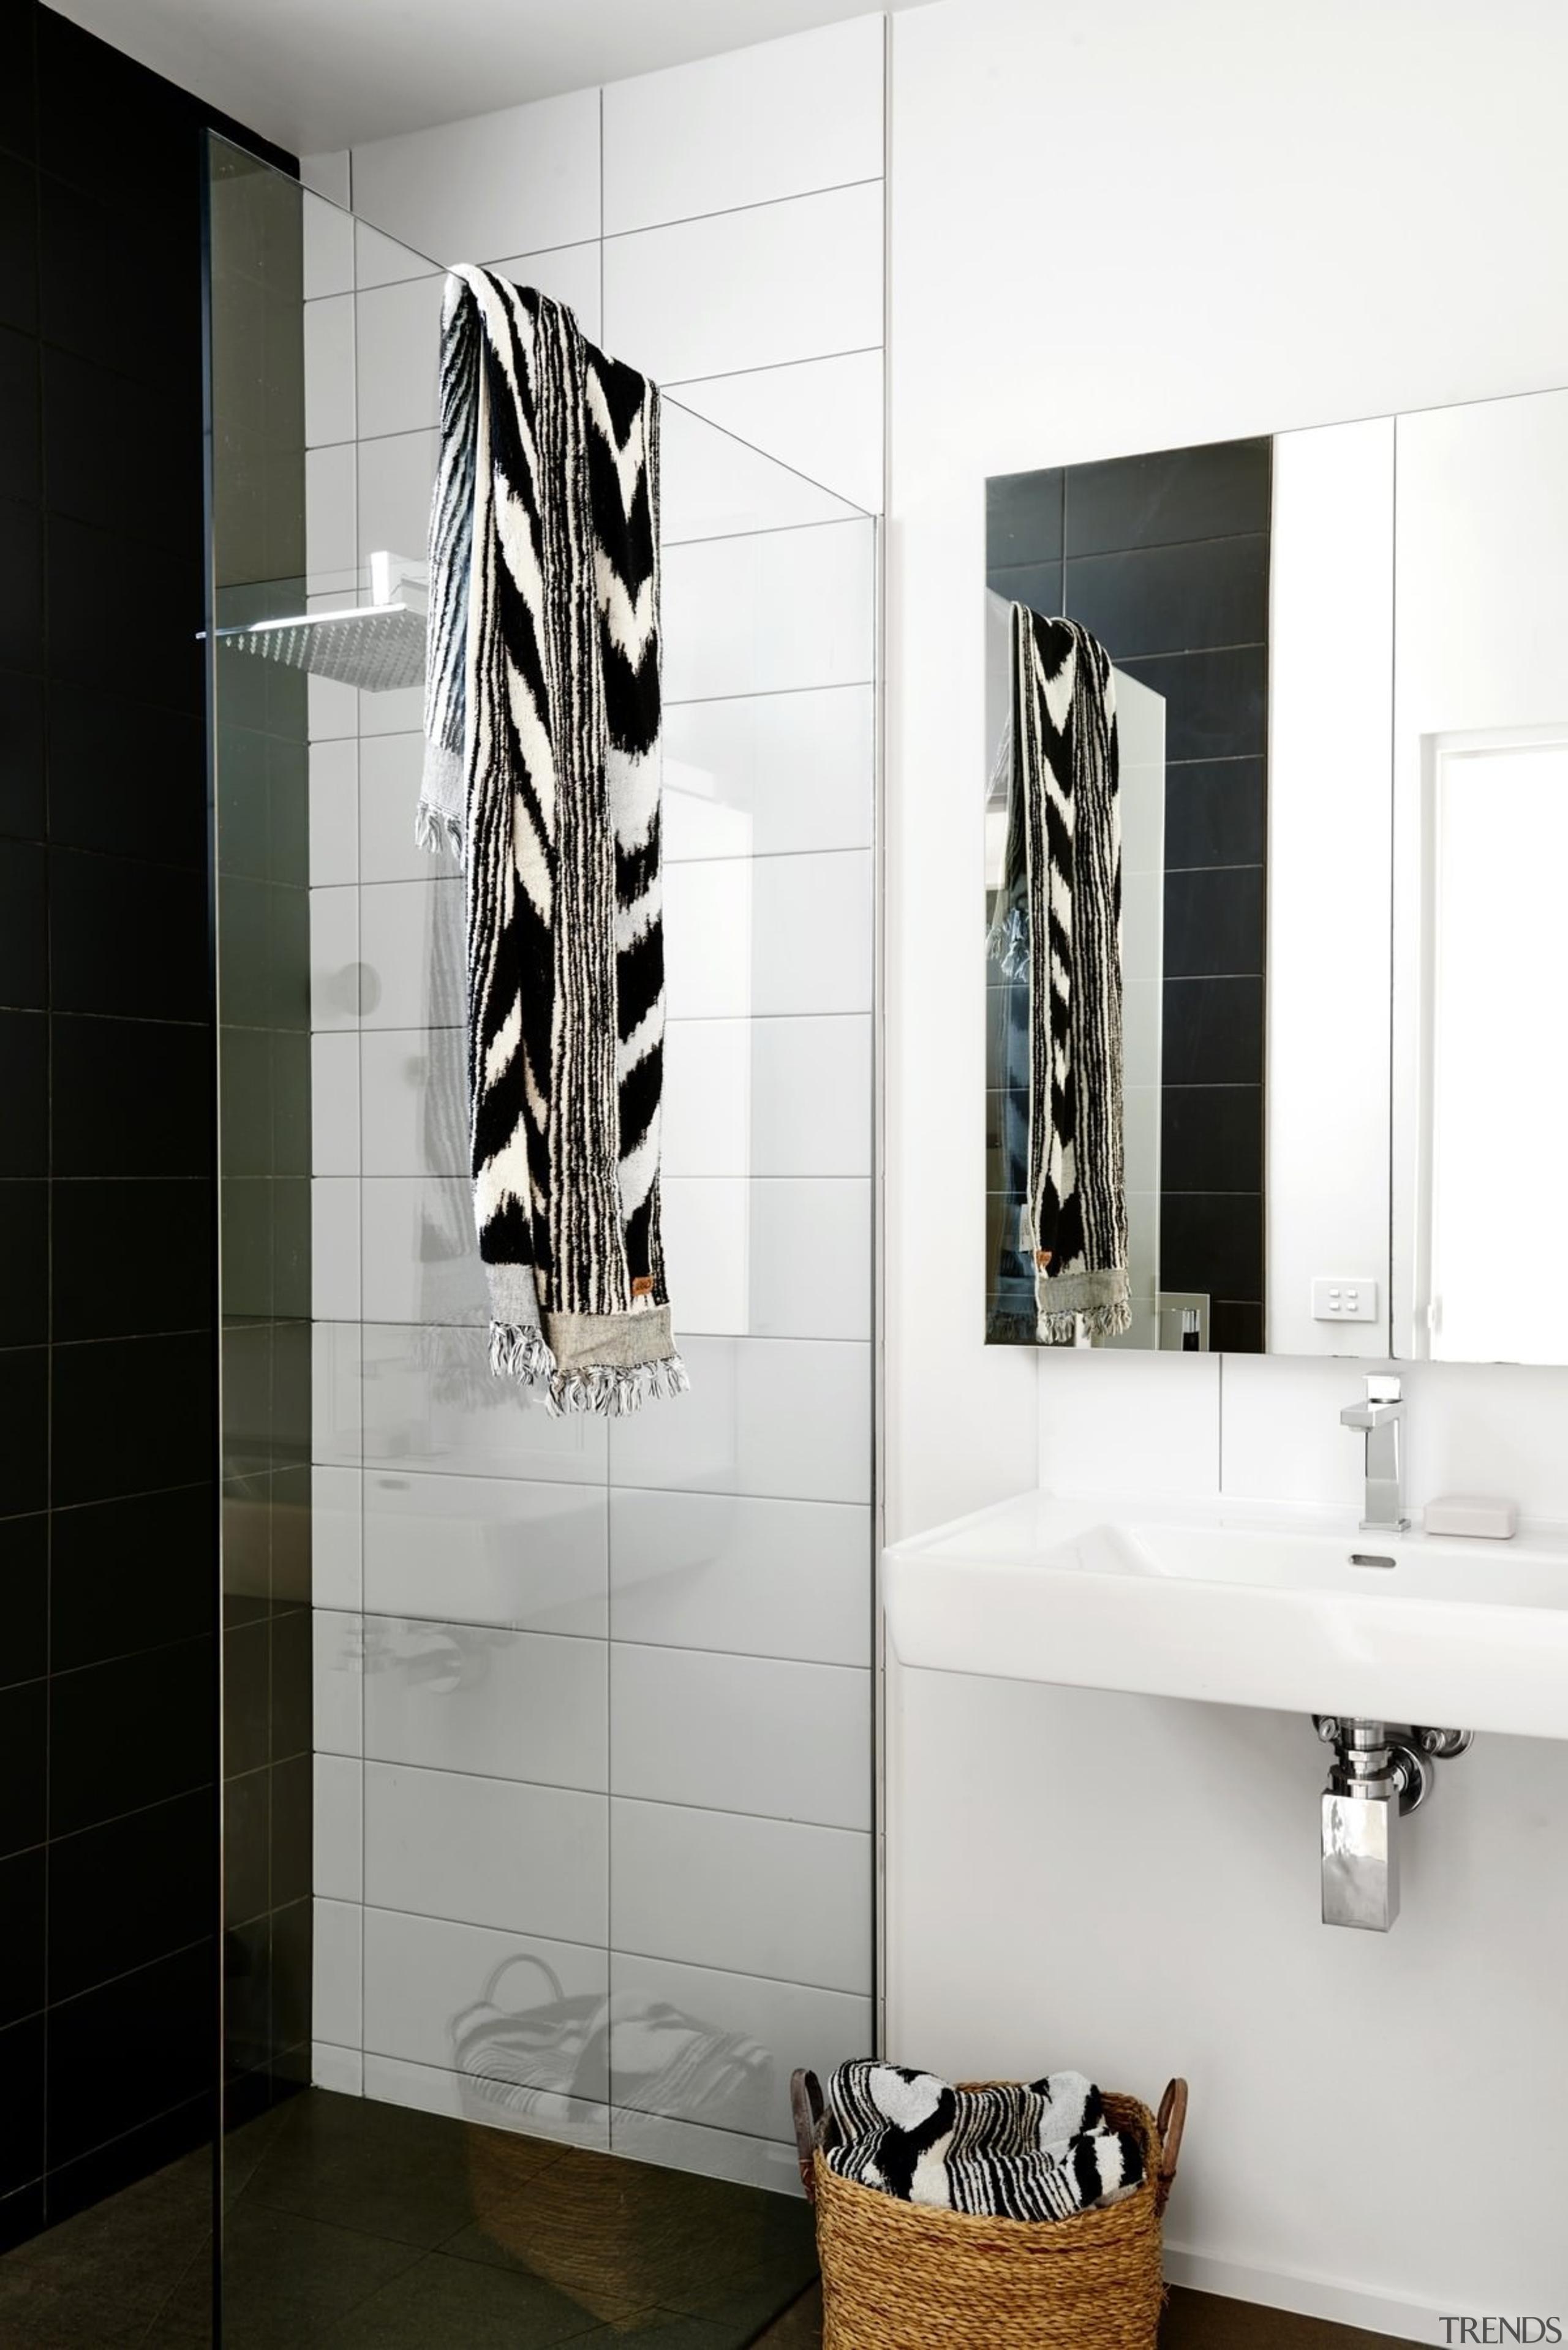 Architect: Irons McDuff ArchitecturePhotography by Nikole Ramsay bathroom, bathroom accessory, bathroom cabinet, floor, flooring, interior design, plumbing fixture, product design, room, tap, tile, wall, white, black